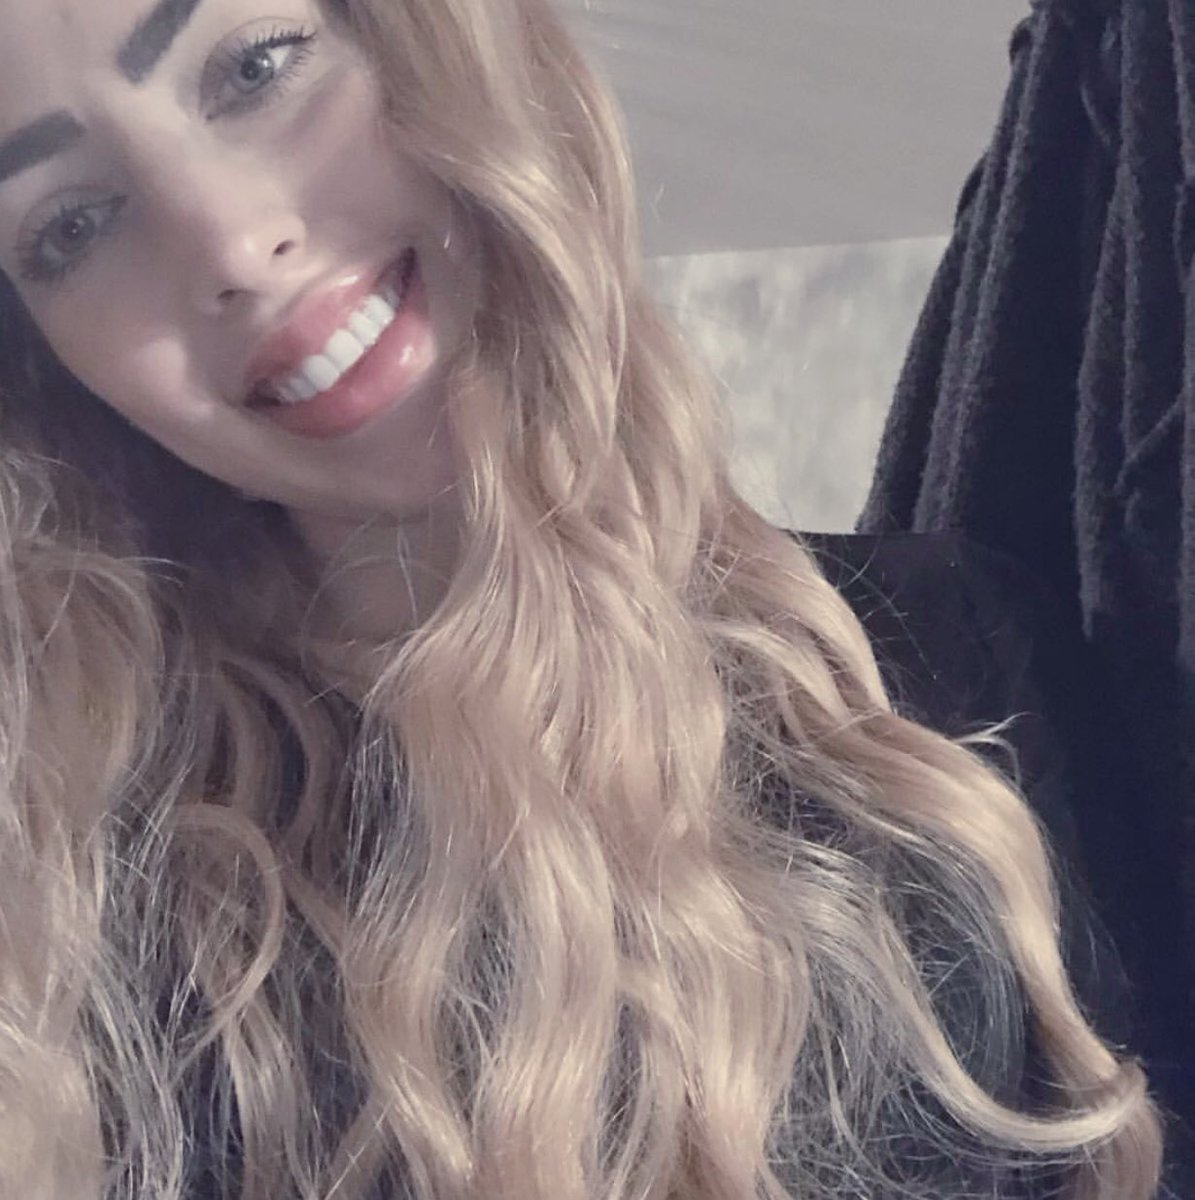 Idk...I think I've pulled off a #blonde wig a little better... #dainty #gorl #danalynnreid  excuse my  teeth https://twitter.com/FutureBecky/status/1263453888126091264…pic.twitter.com/2OAXyZuaLX